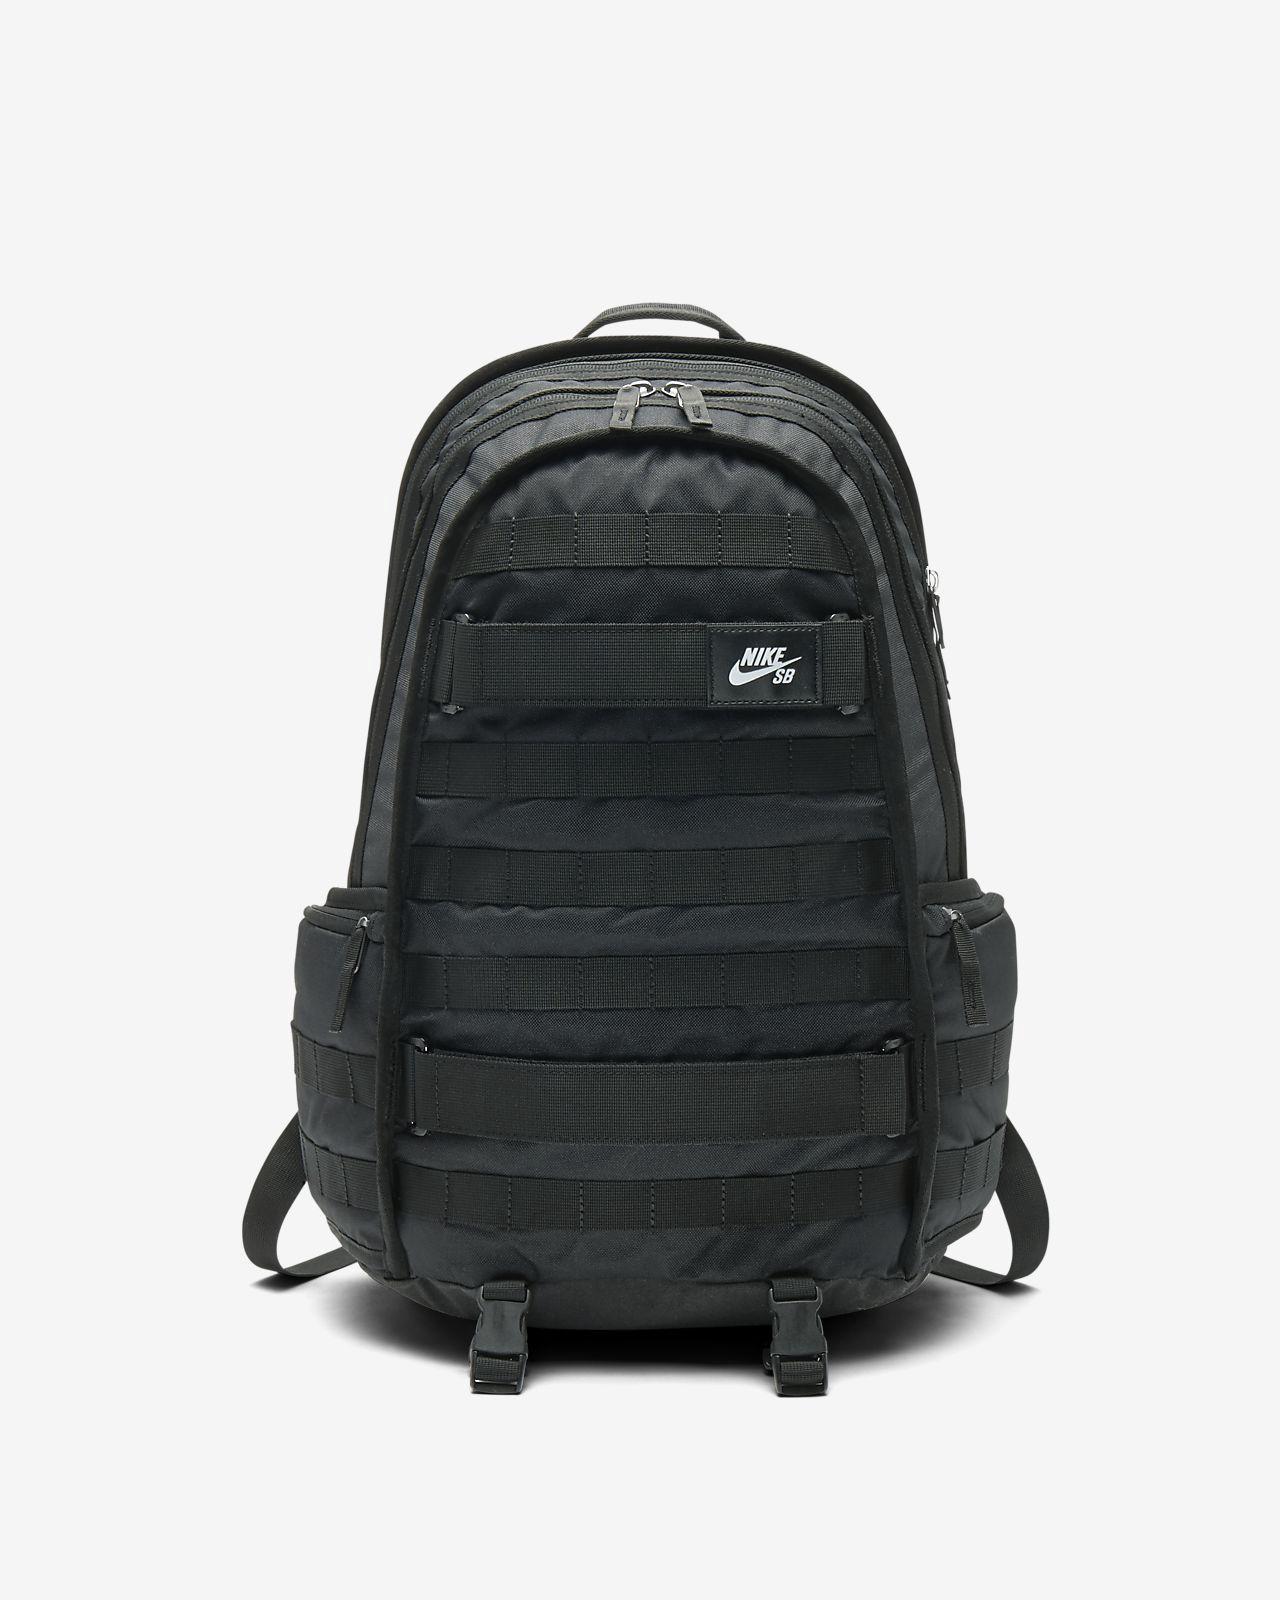 2ddfb68c23e5 Nike Sb Rpm Skateboarding Backpack - Black Black Black Os